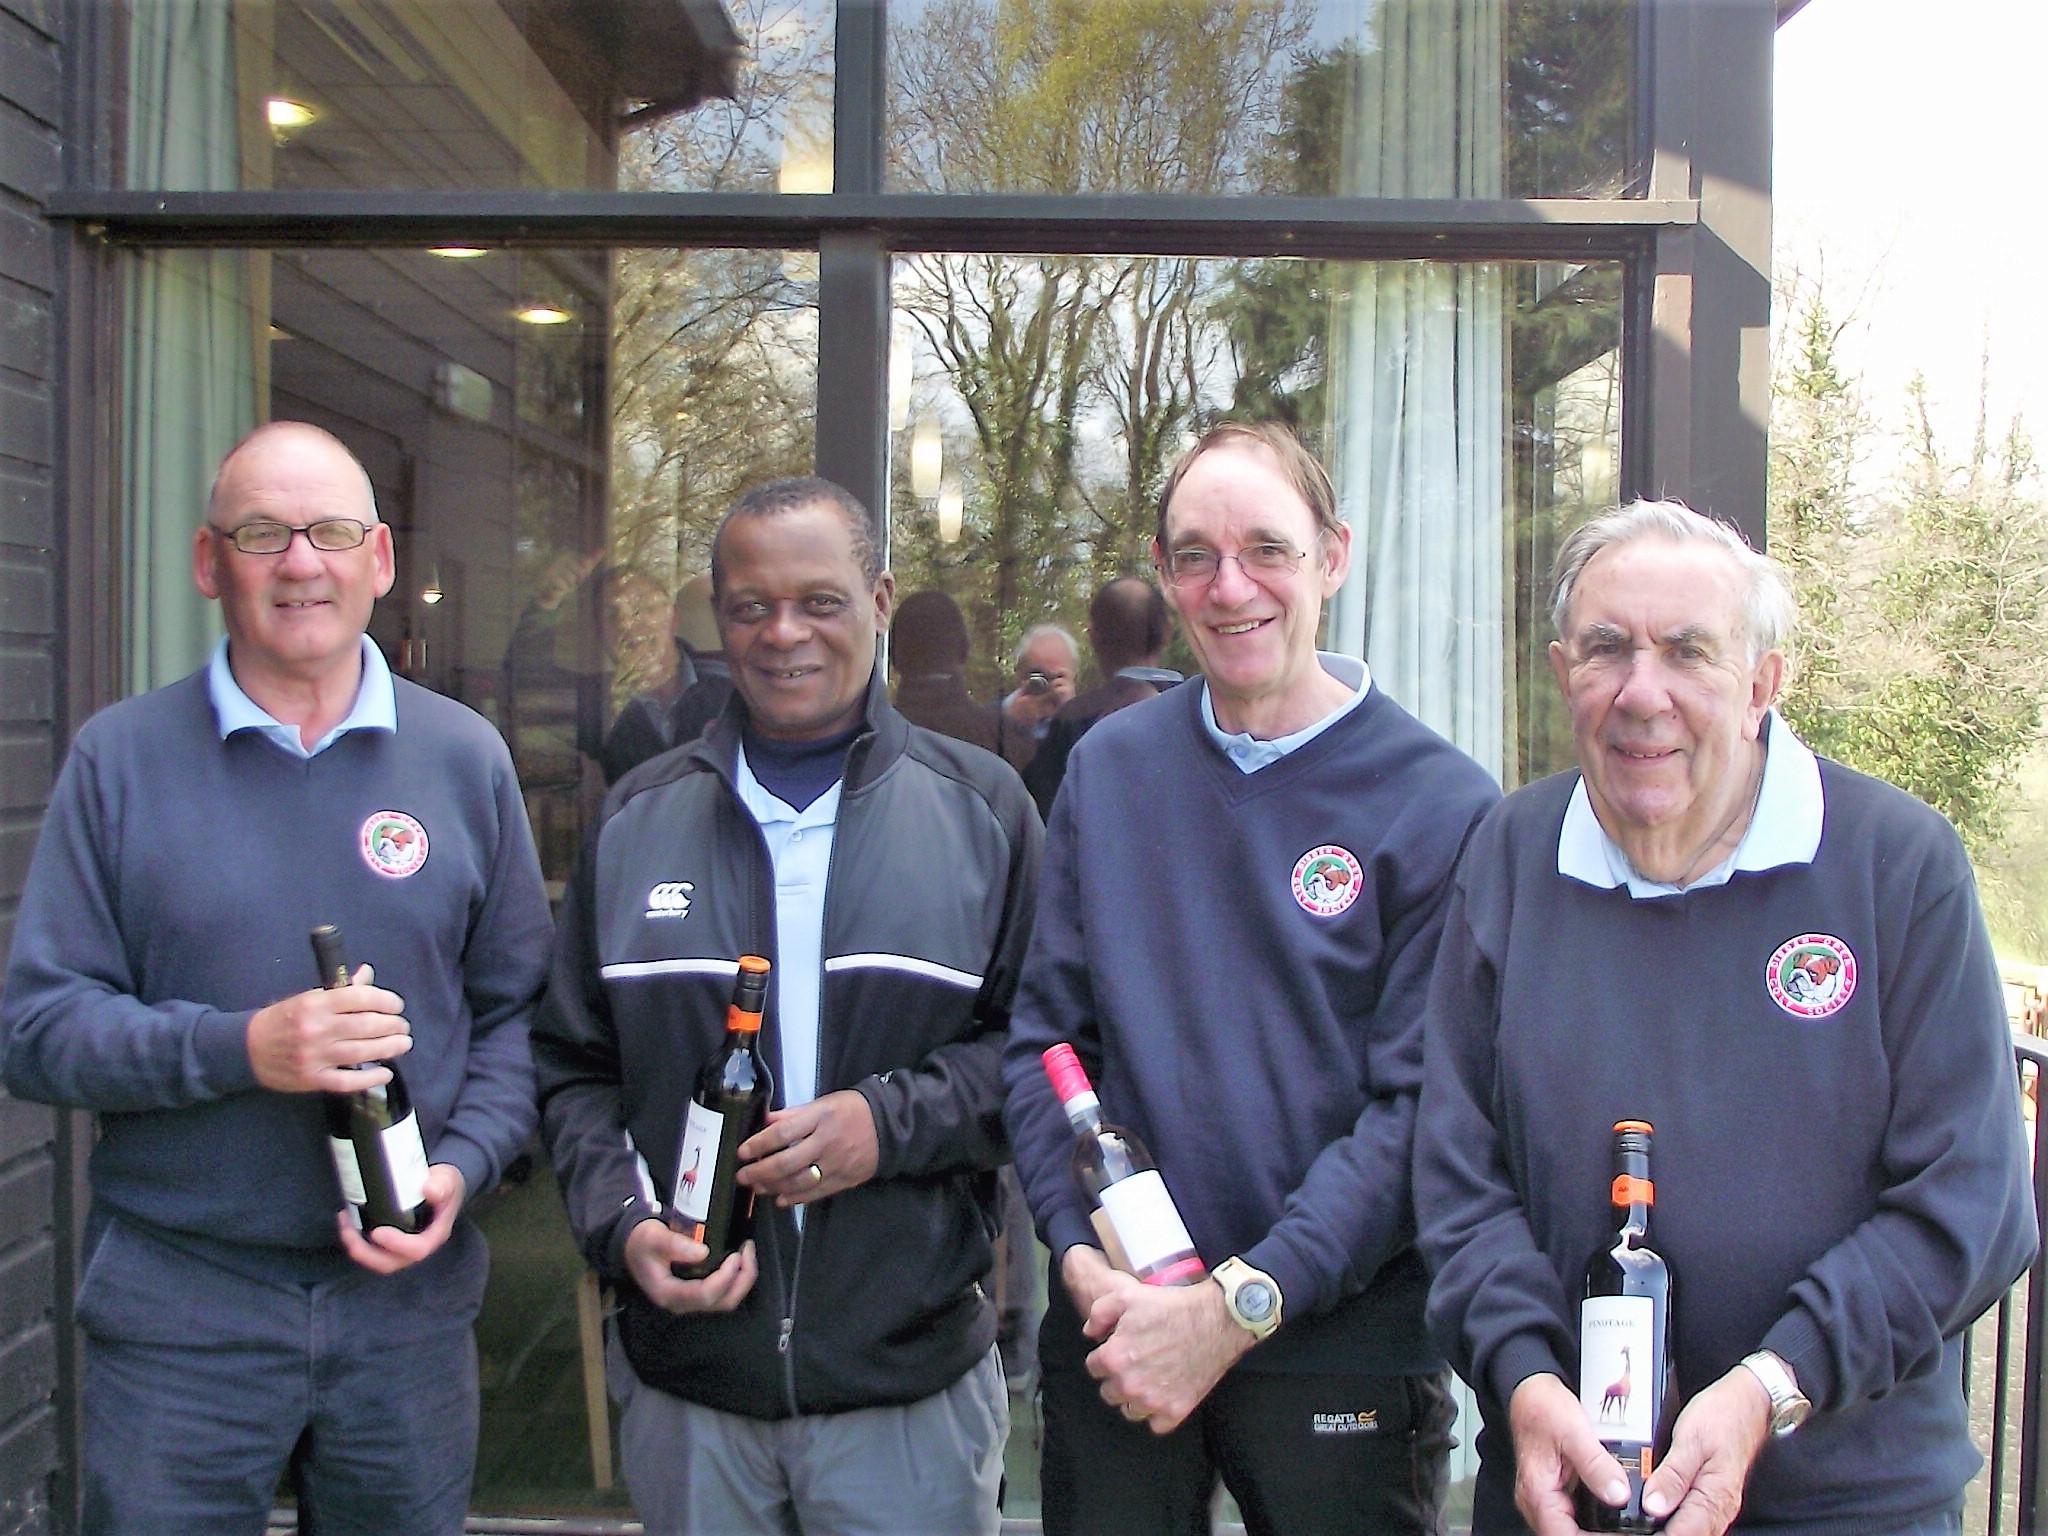 2 April: Wine Winners L to R Keith Maton P/A 15th; Elijha Nkomo N/P 2nd; Roger James N/P 11th; Roy Cooper N/P 4th (9 hole)